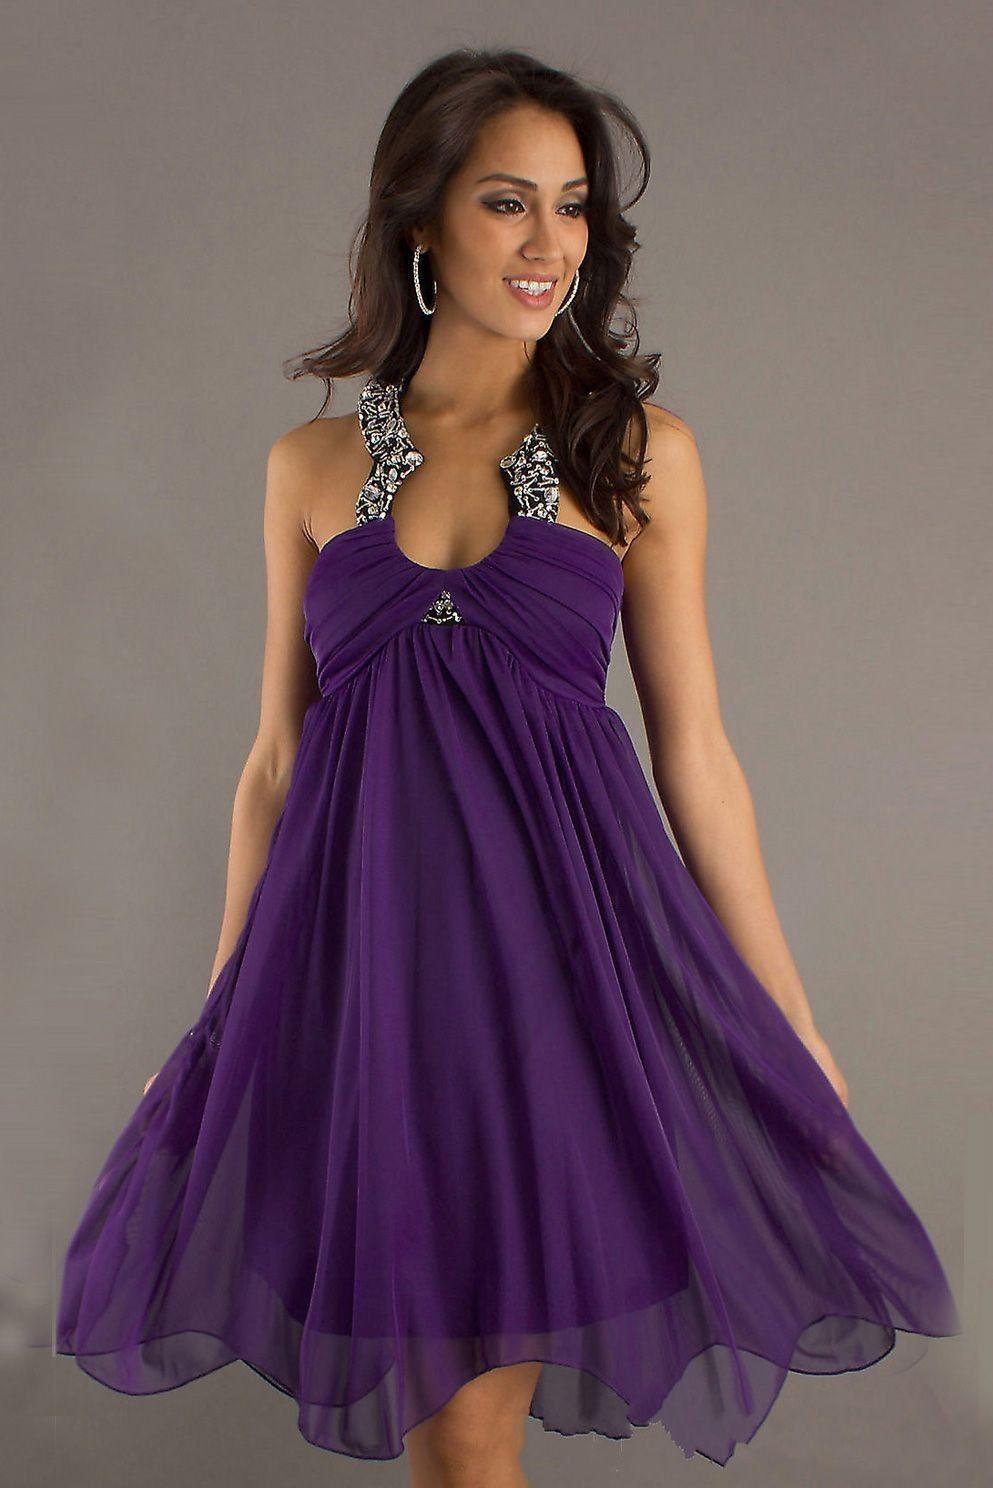 Pin de Talica Coetzer en Purple Passion | Pinterest | Púrpura, Ojos ...